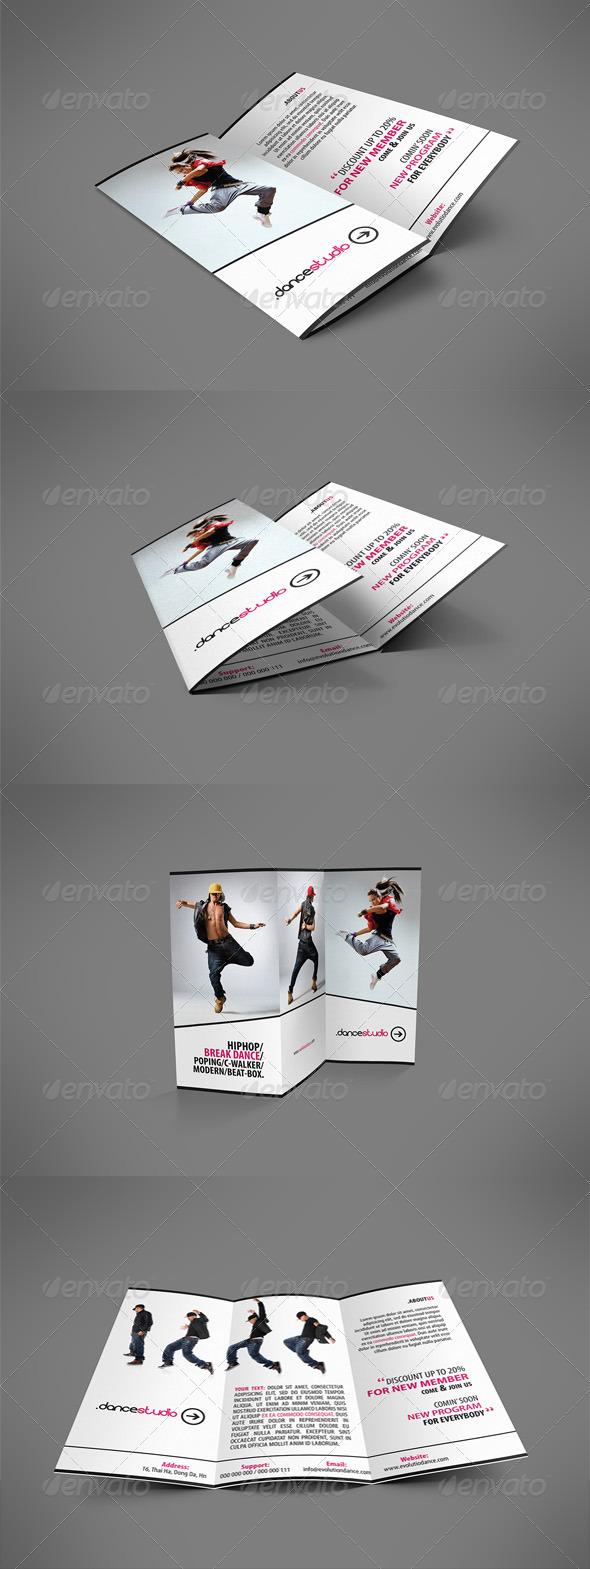 GraphicRiver Street Art Brochure Tri-fold 3985149